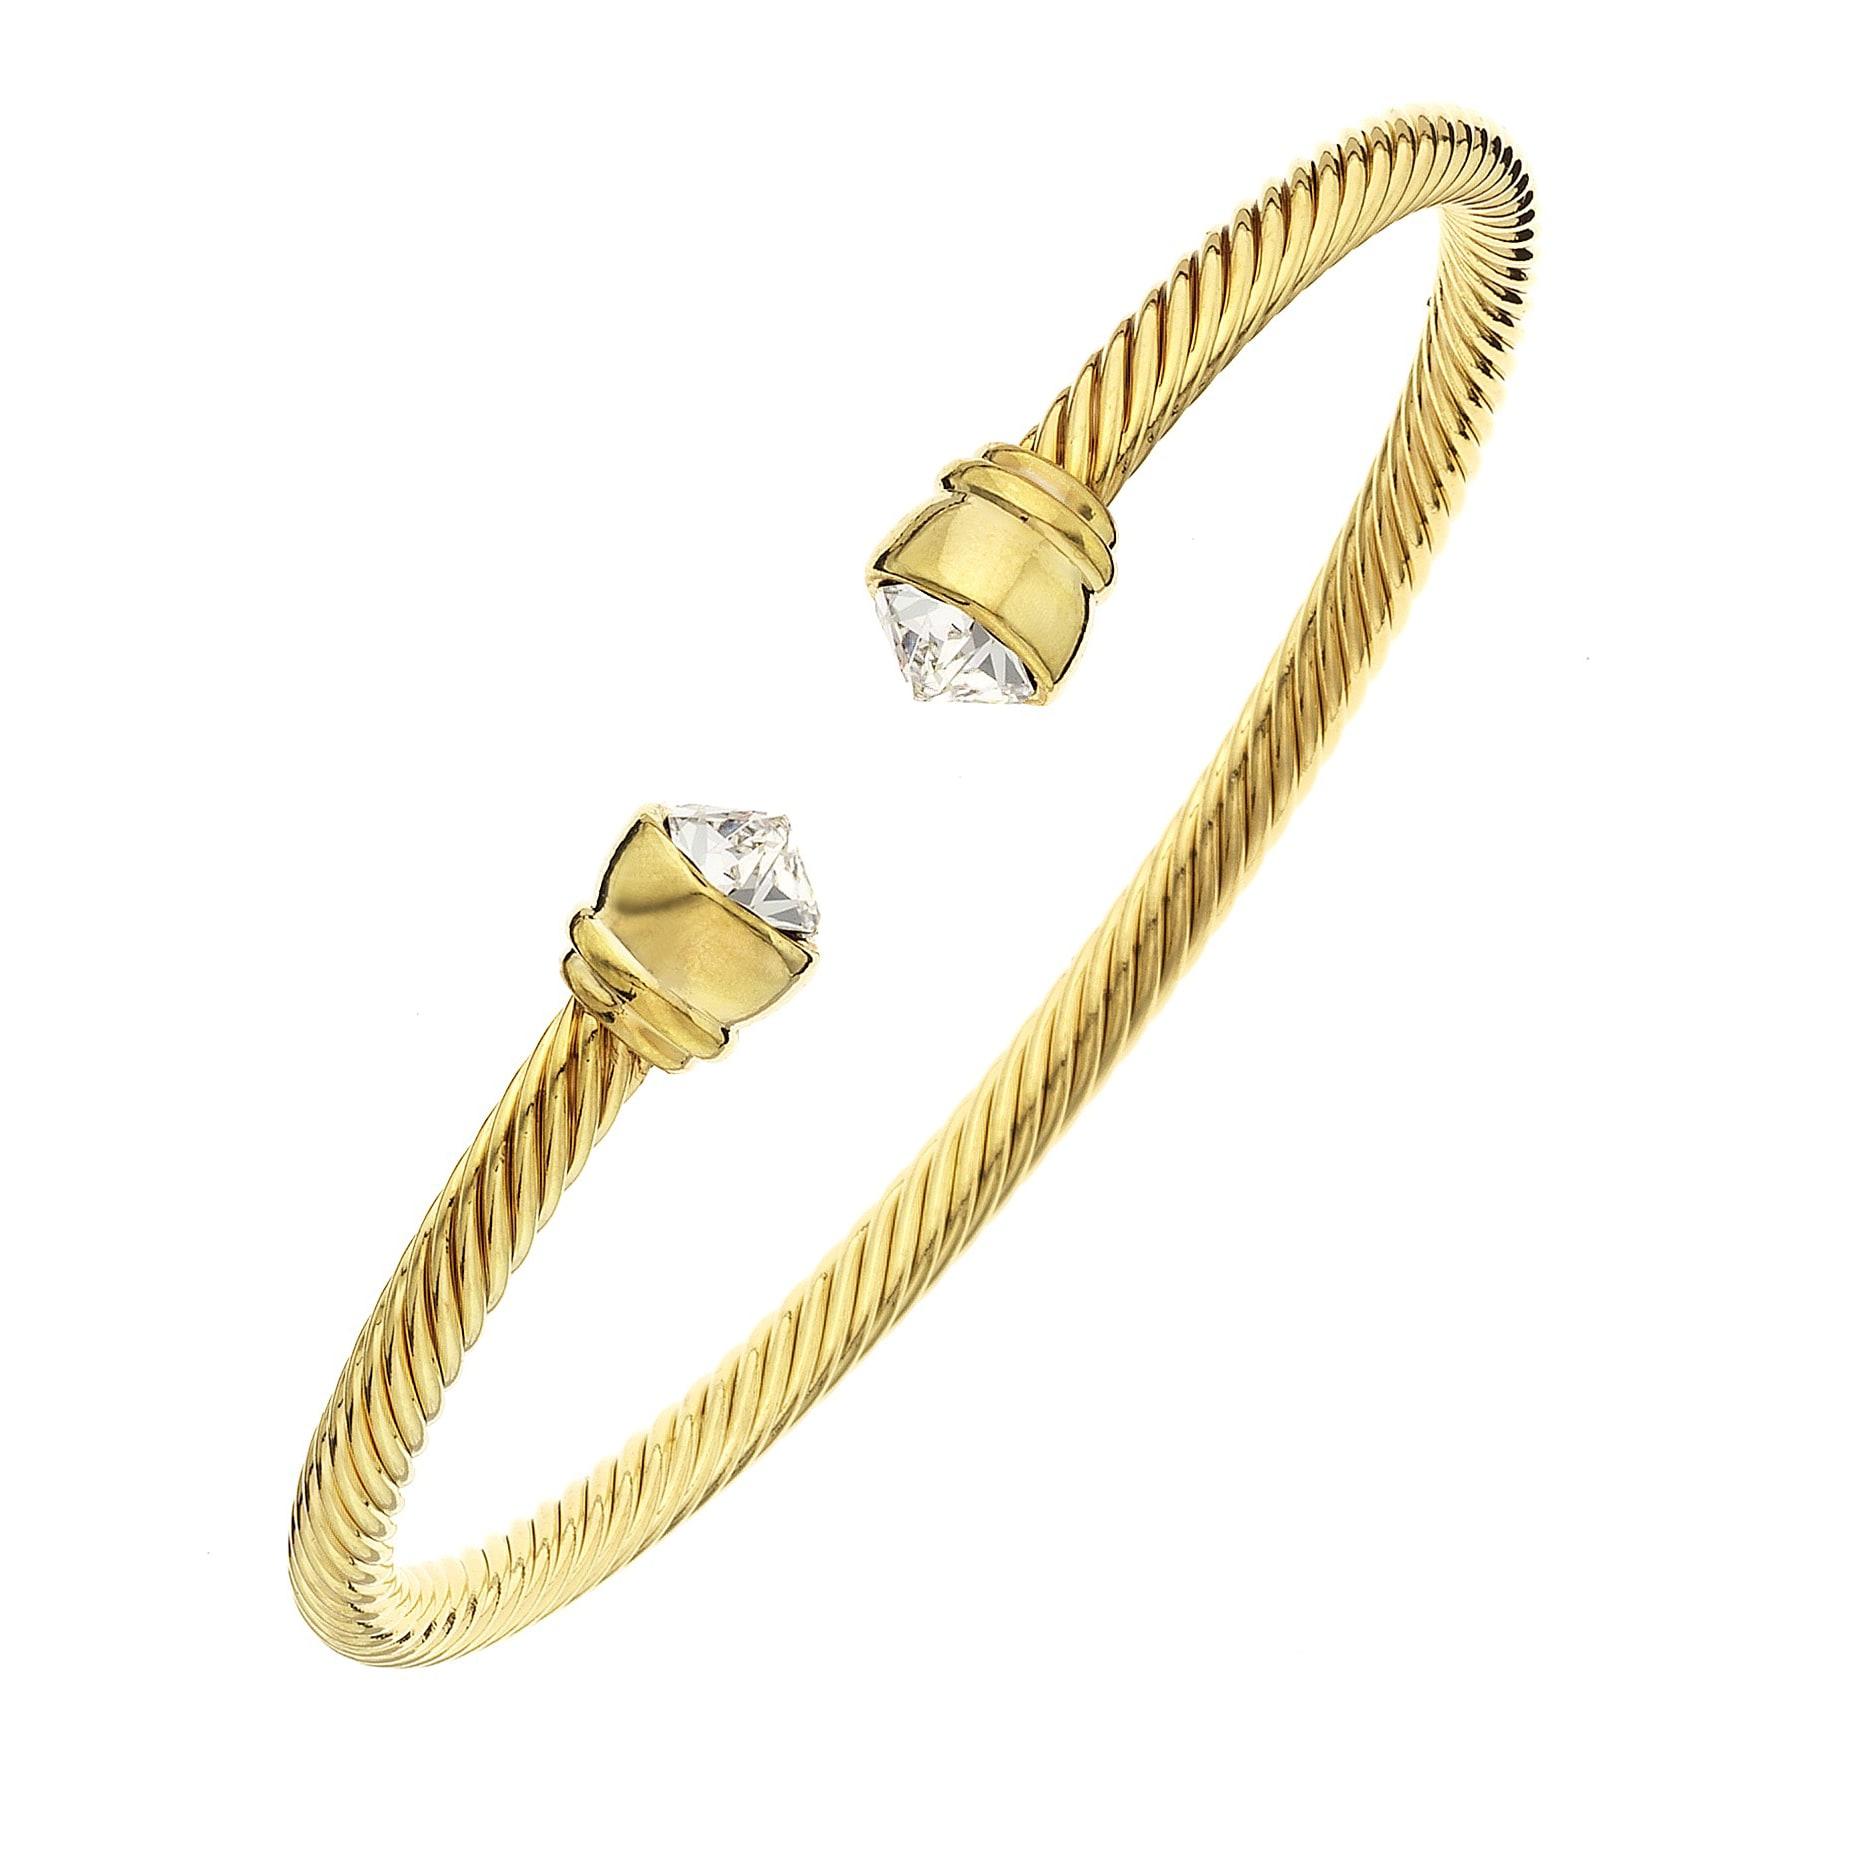 Isla Simone - Gold-Plated Corrugated Flex Bangle With Cle...